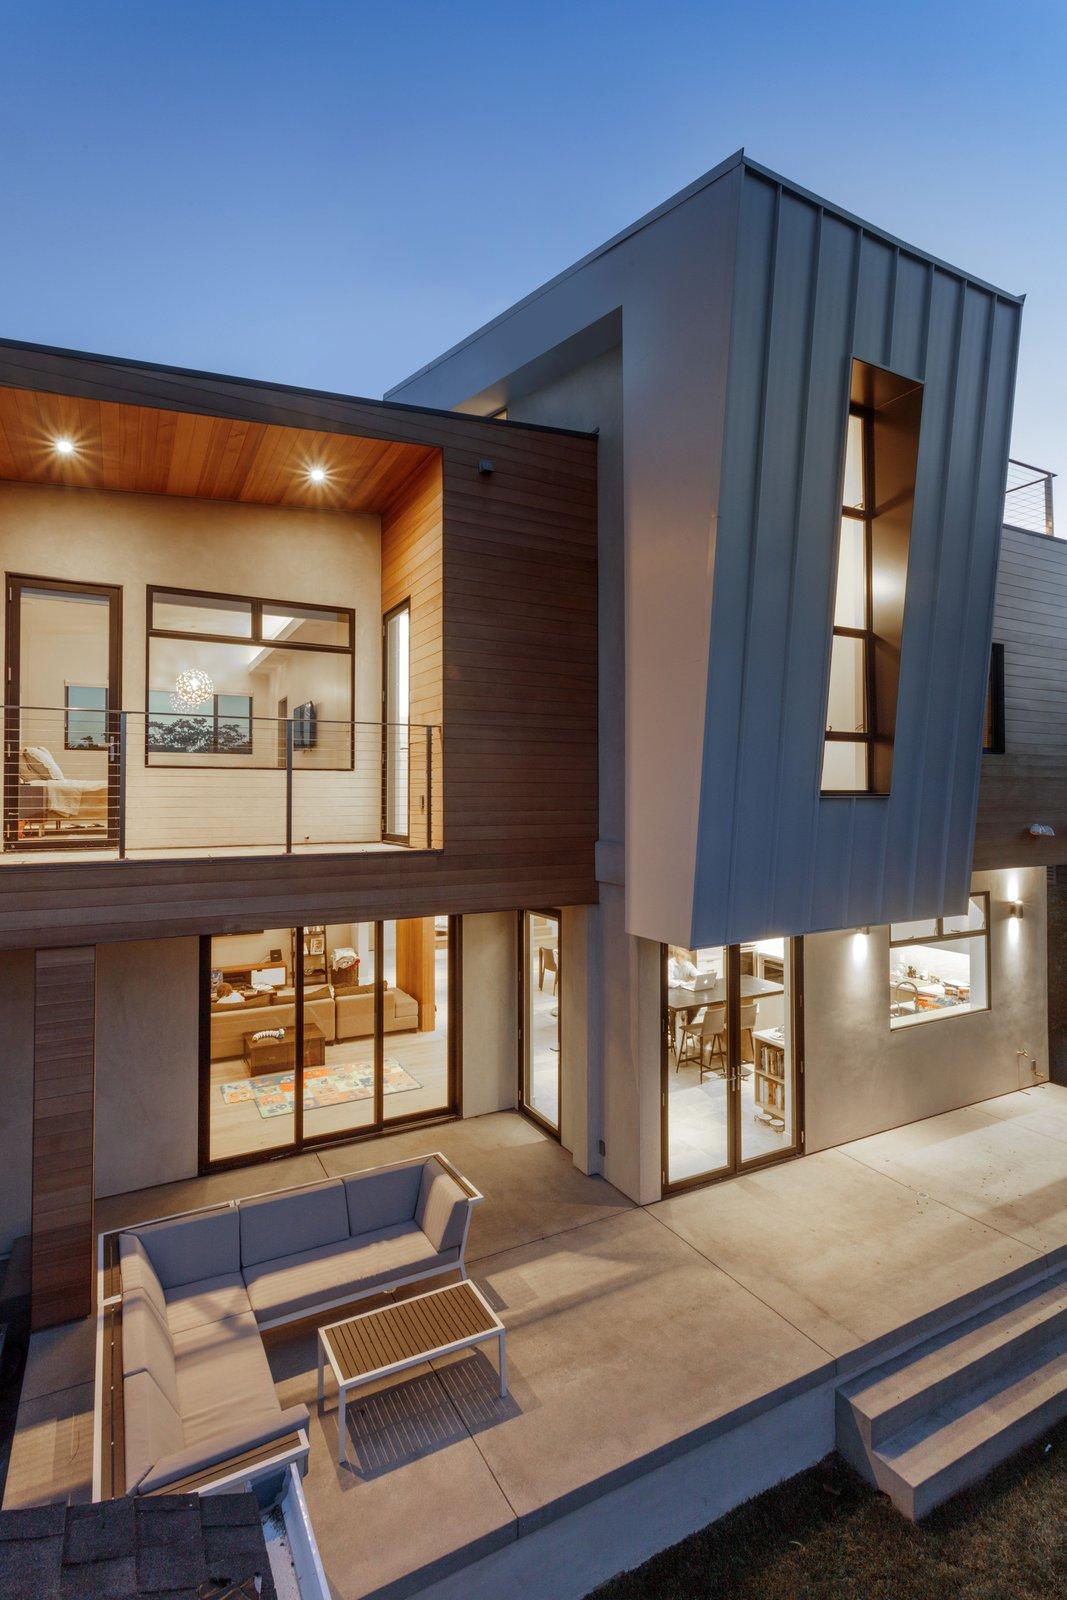 Exterior, House Building Type, Stucco Siding Material, Wood Siding Material, and Metal Siding Material back patio  Legal House